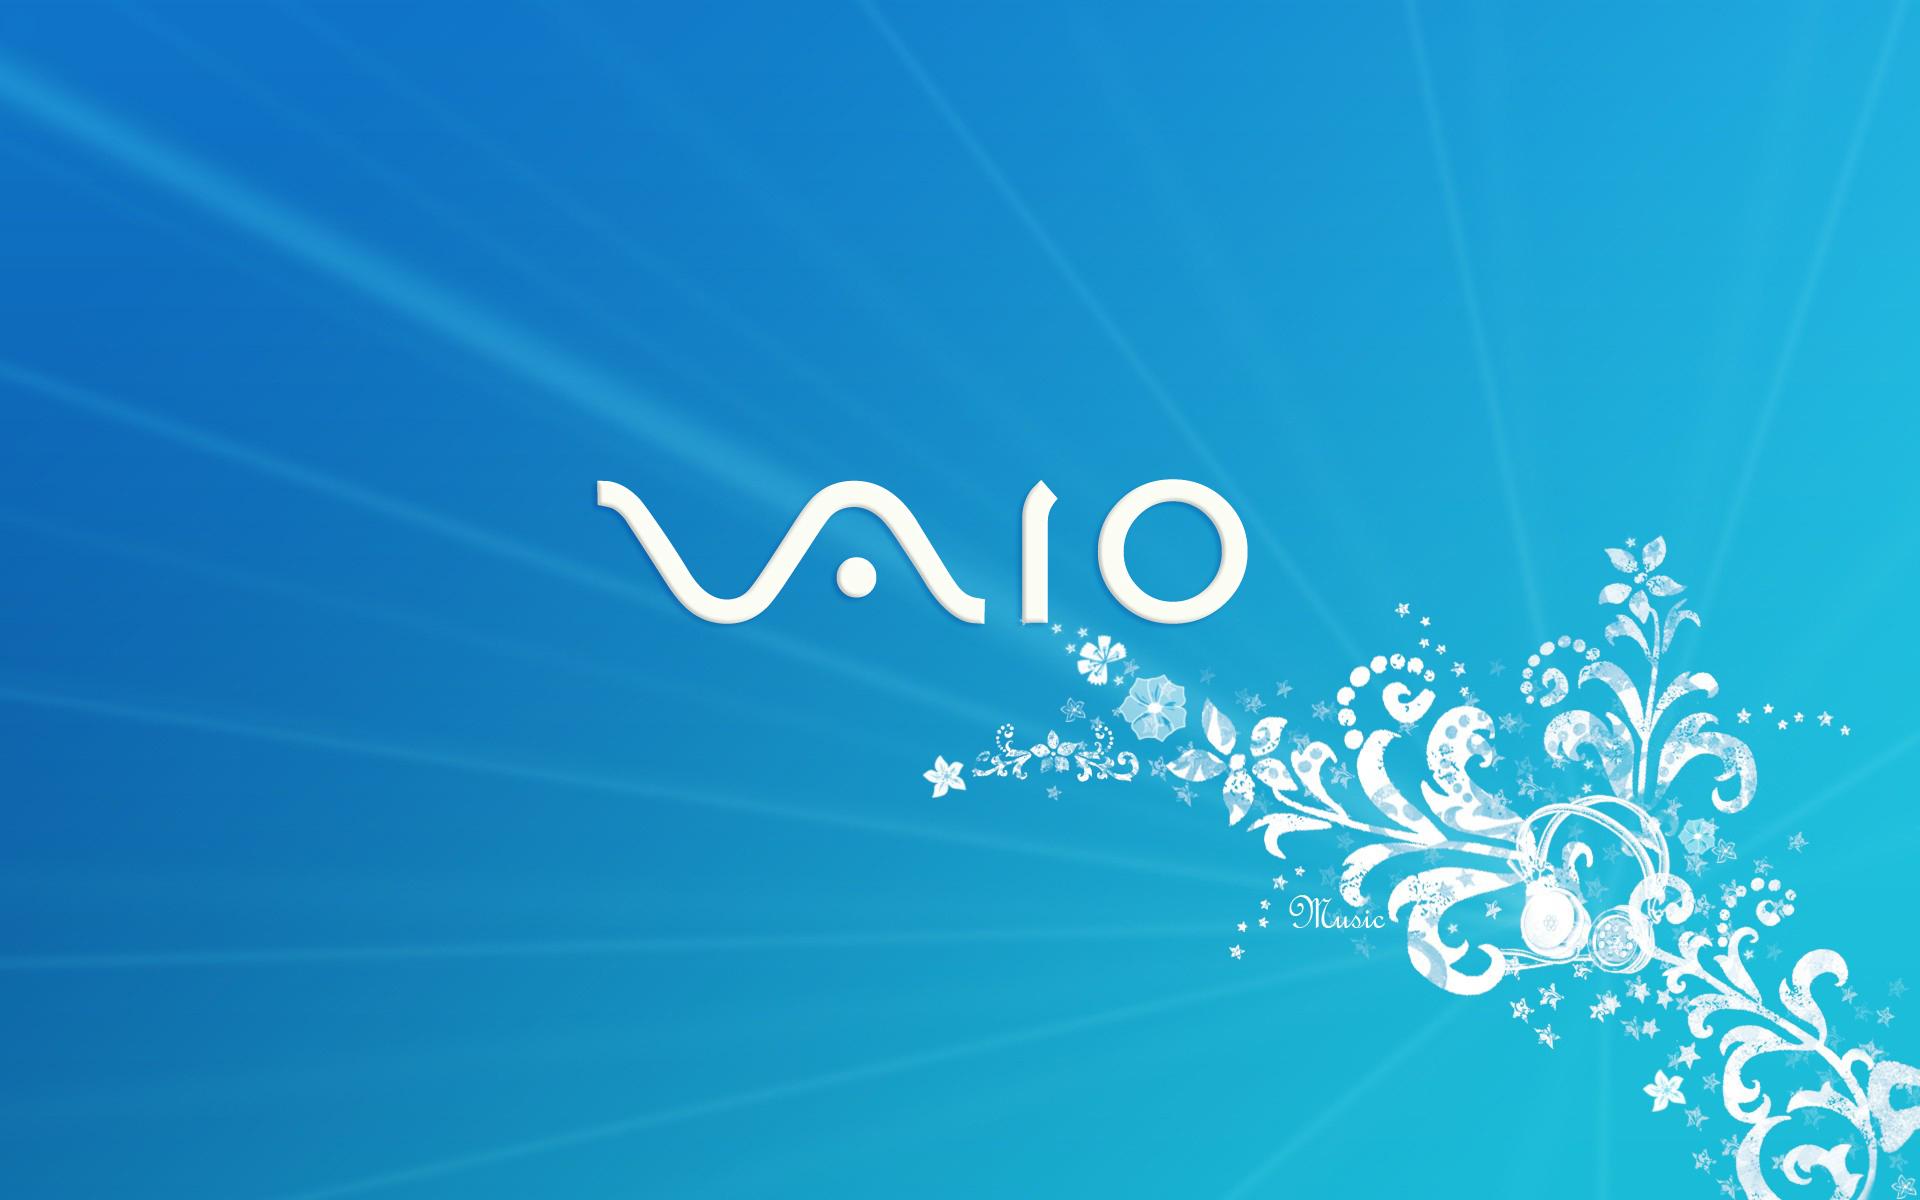 Vaio Hd Wallpapers 9922 Wallpaper Wallpaper hd 1920x1200